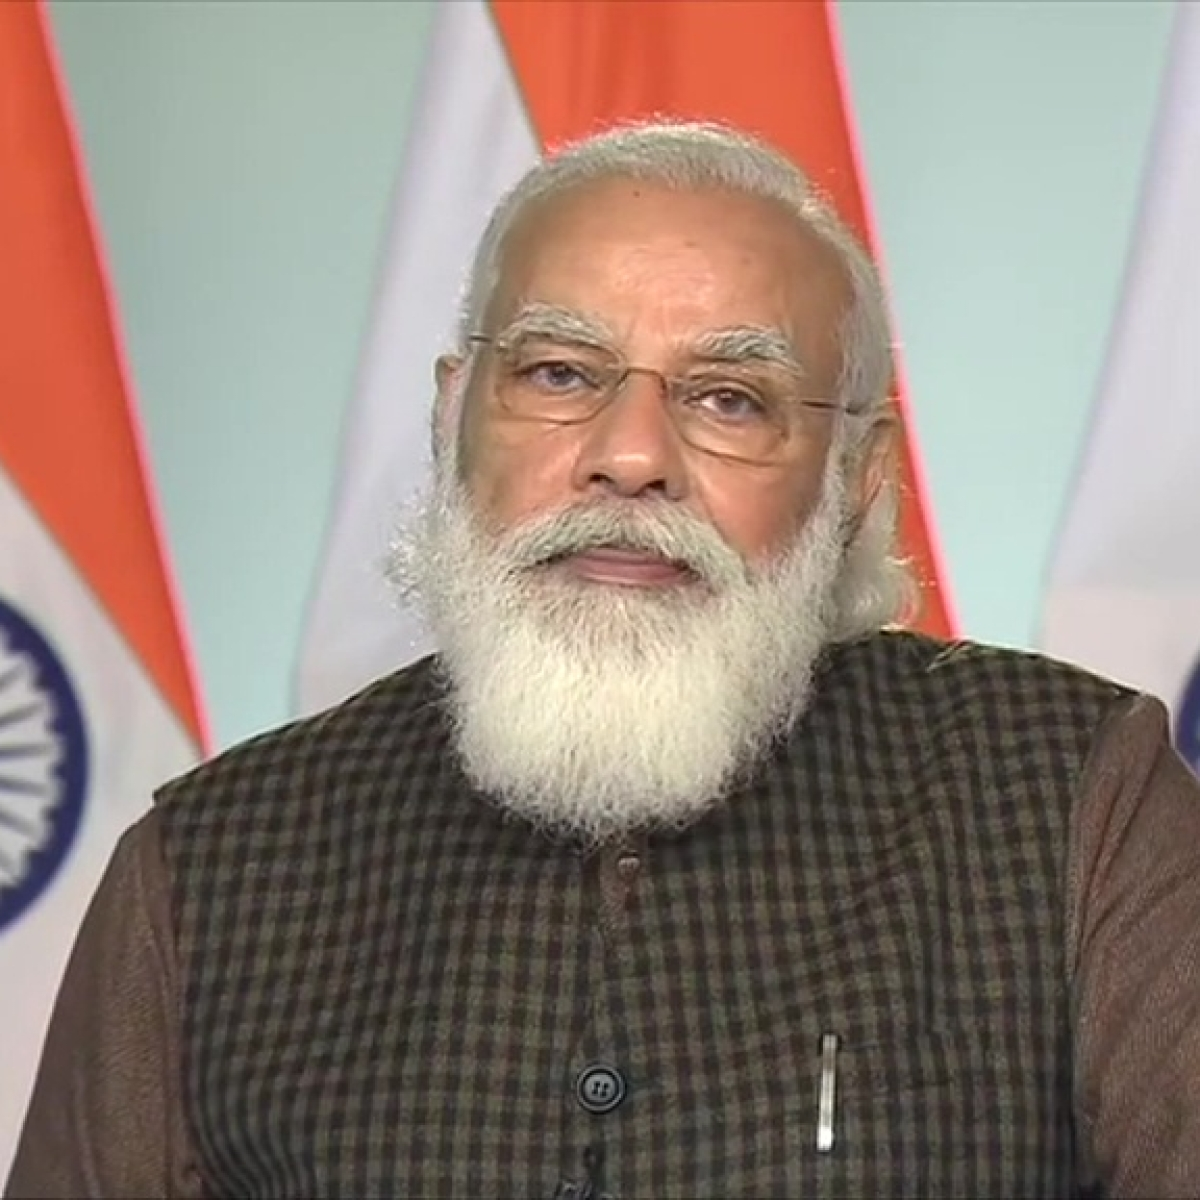 'Dawai bhi, kadai bhi': PM Modi urges people to not let their guard down after COVID-19 vaccination